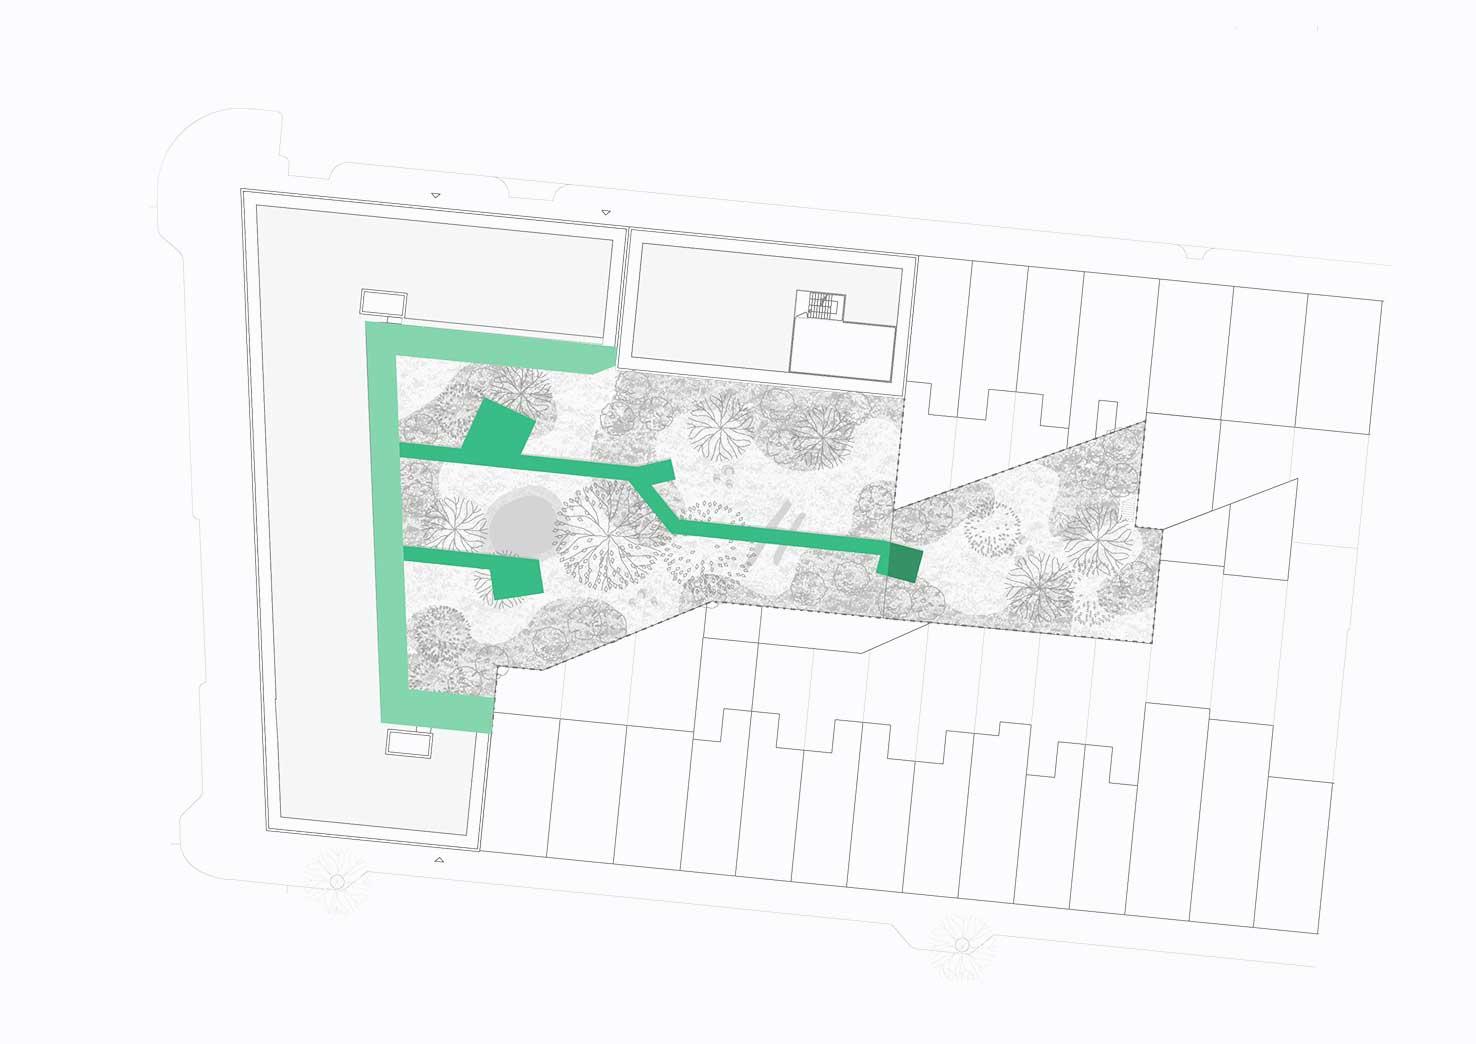 HTA-plan-drawing-paths